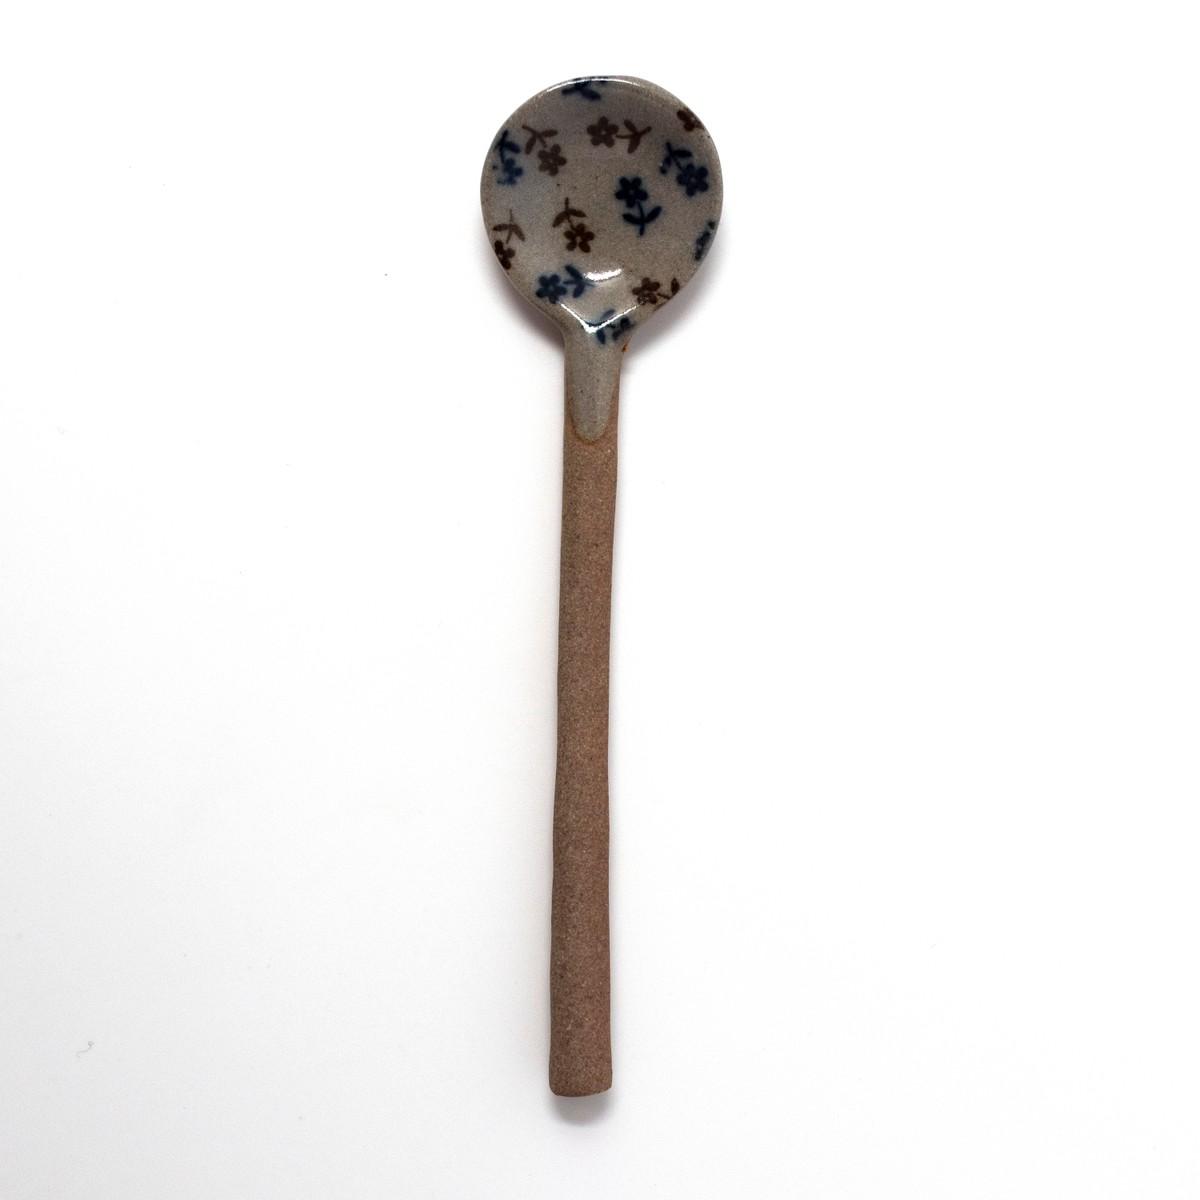 Photo of Mashiko-yaki Spoon: Flowers